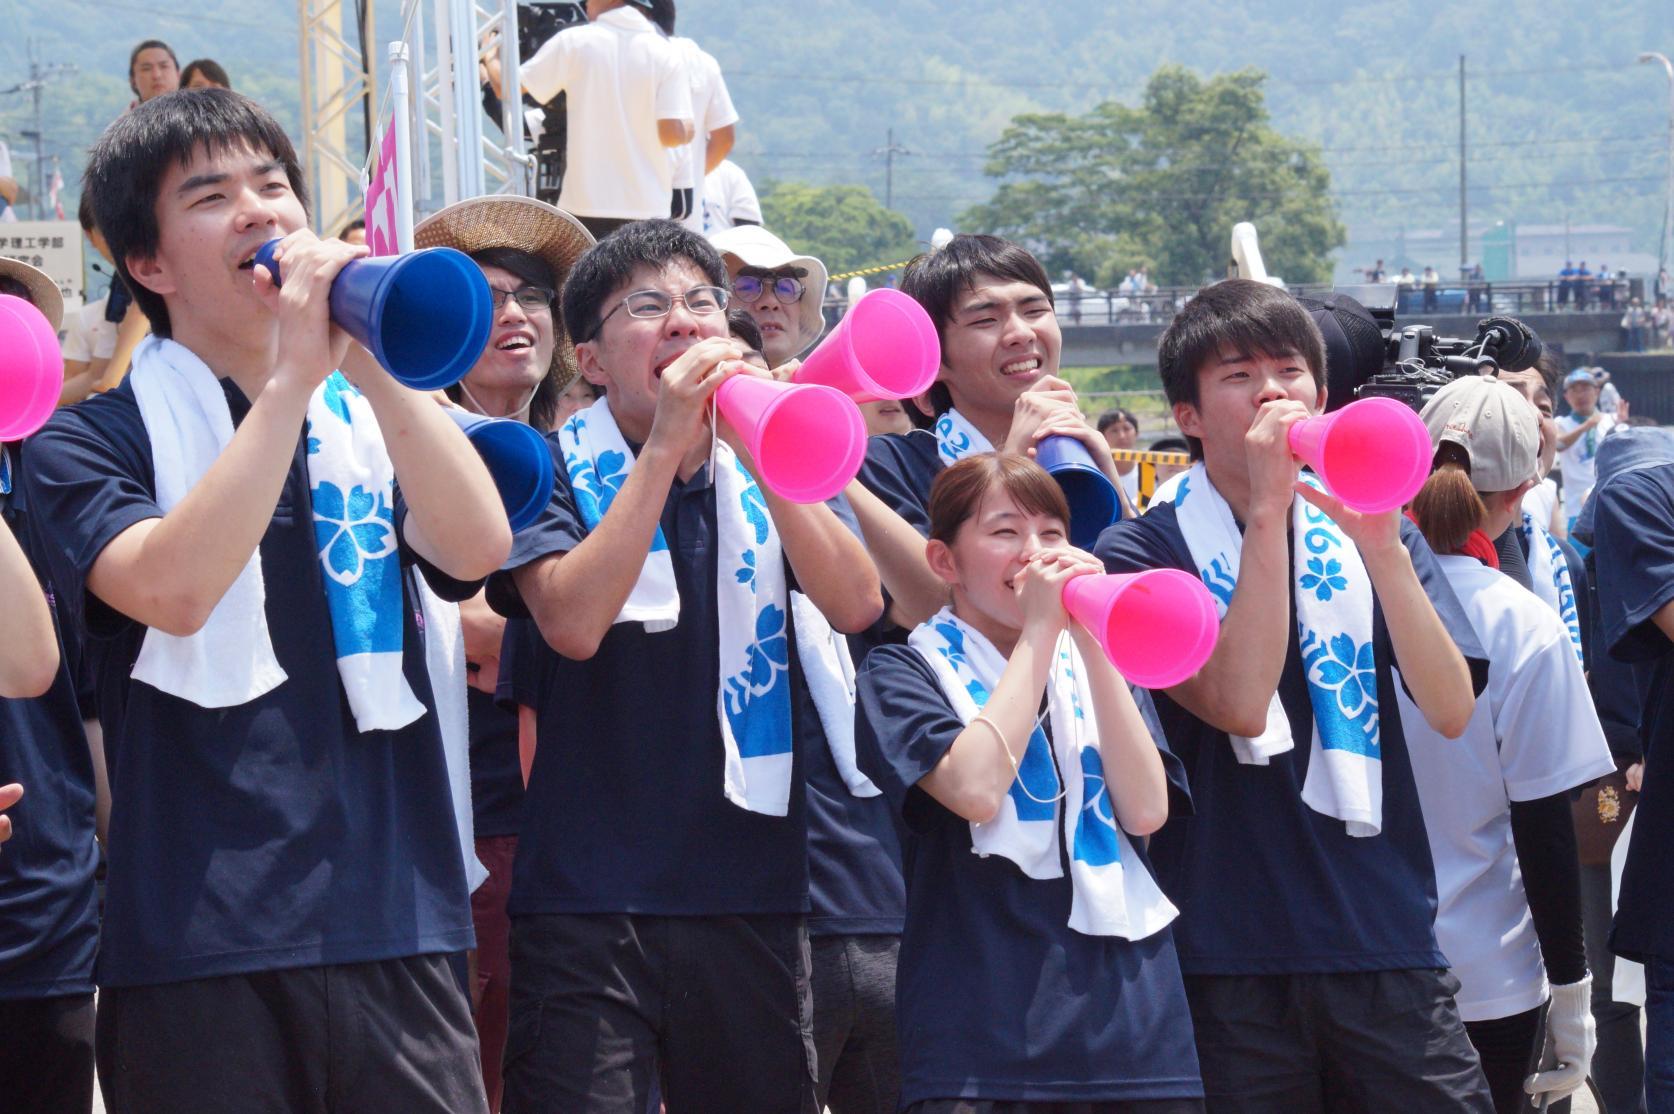 【参加報告】日本大学理工学部航空研究会メーヴェ36「鳥人間コンテスト2019」にて学生新記録達成!!<飛行距離38010.28m>